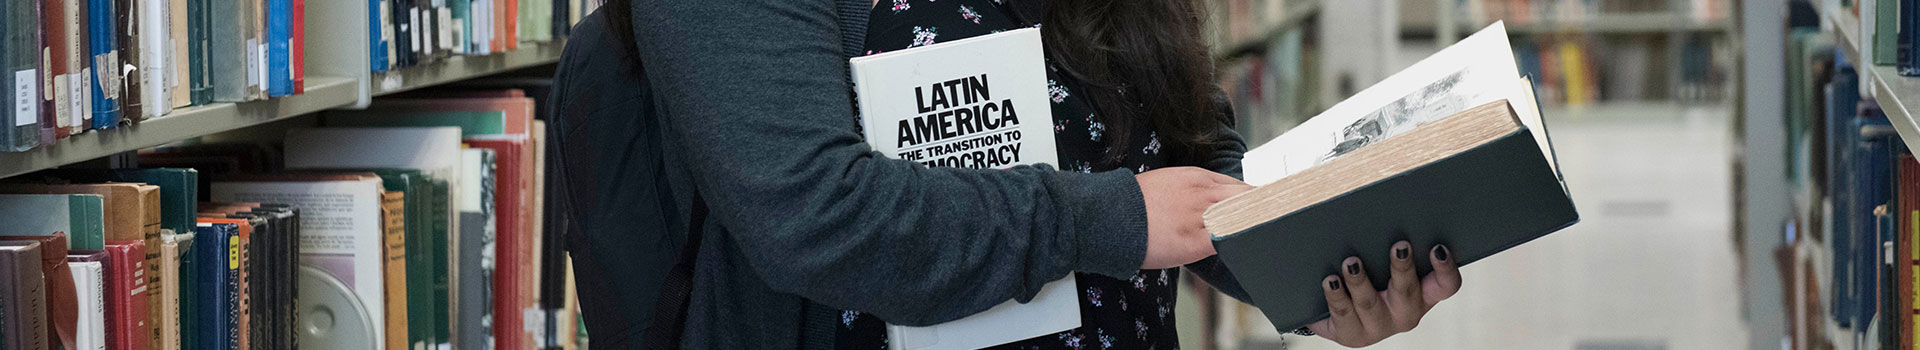 borrowing book